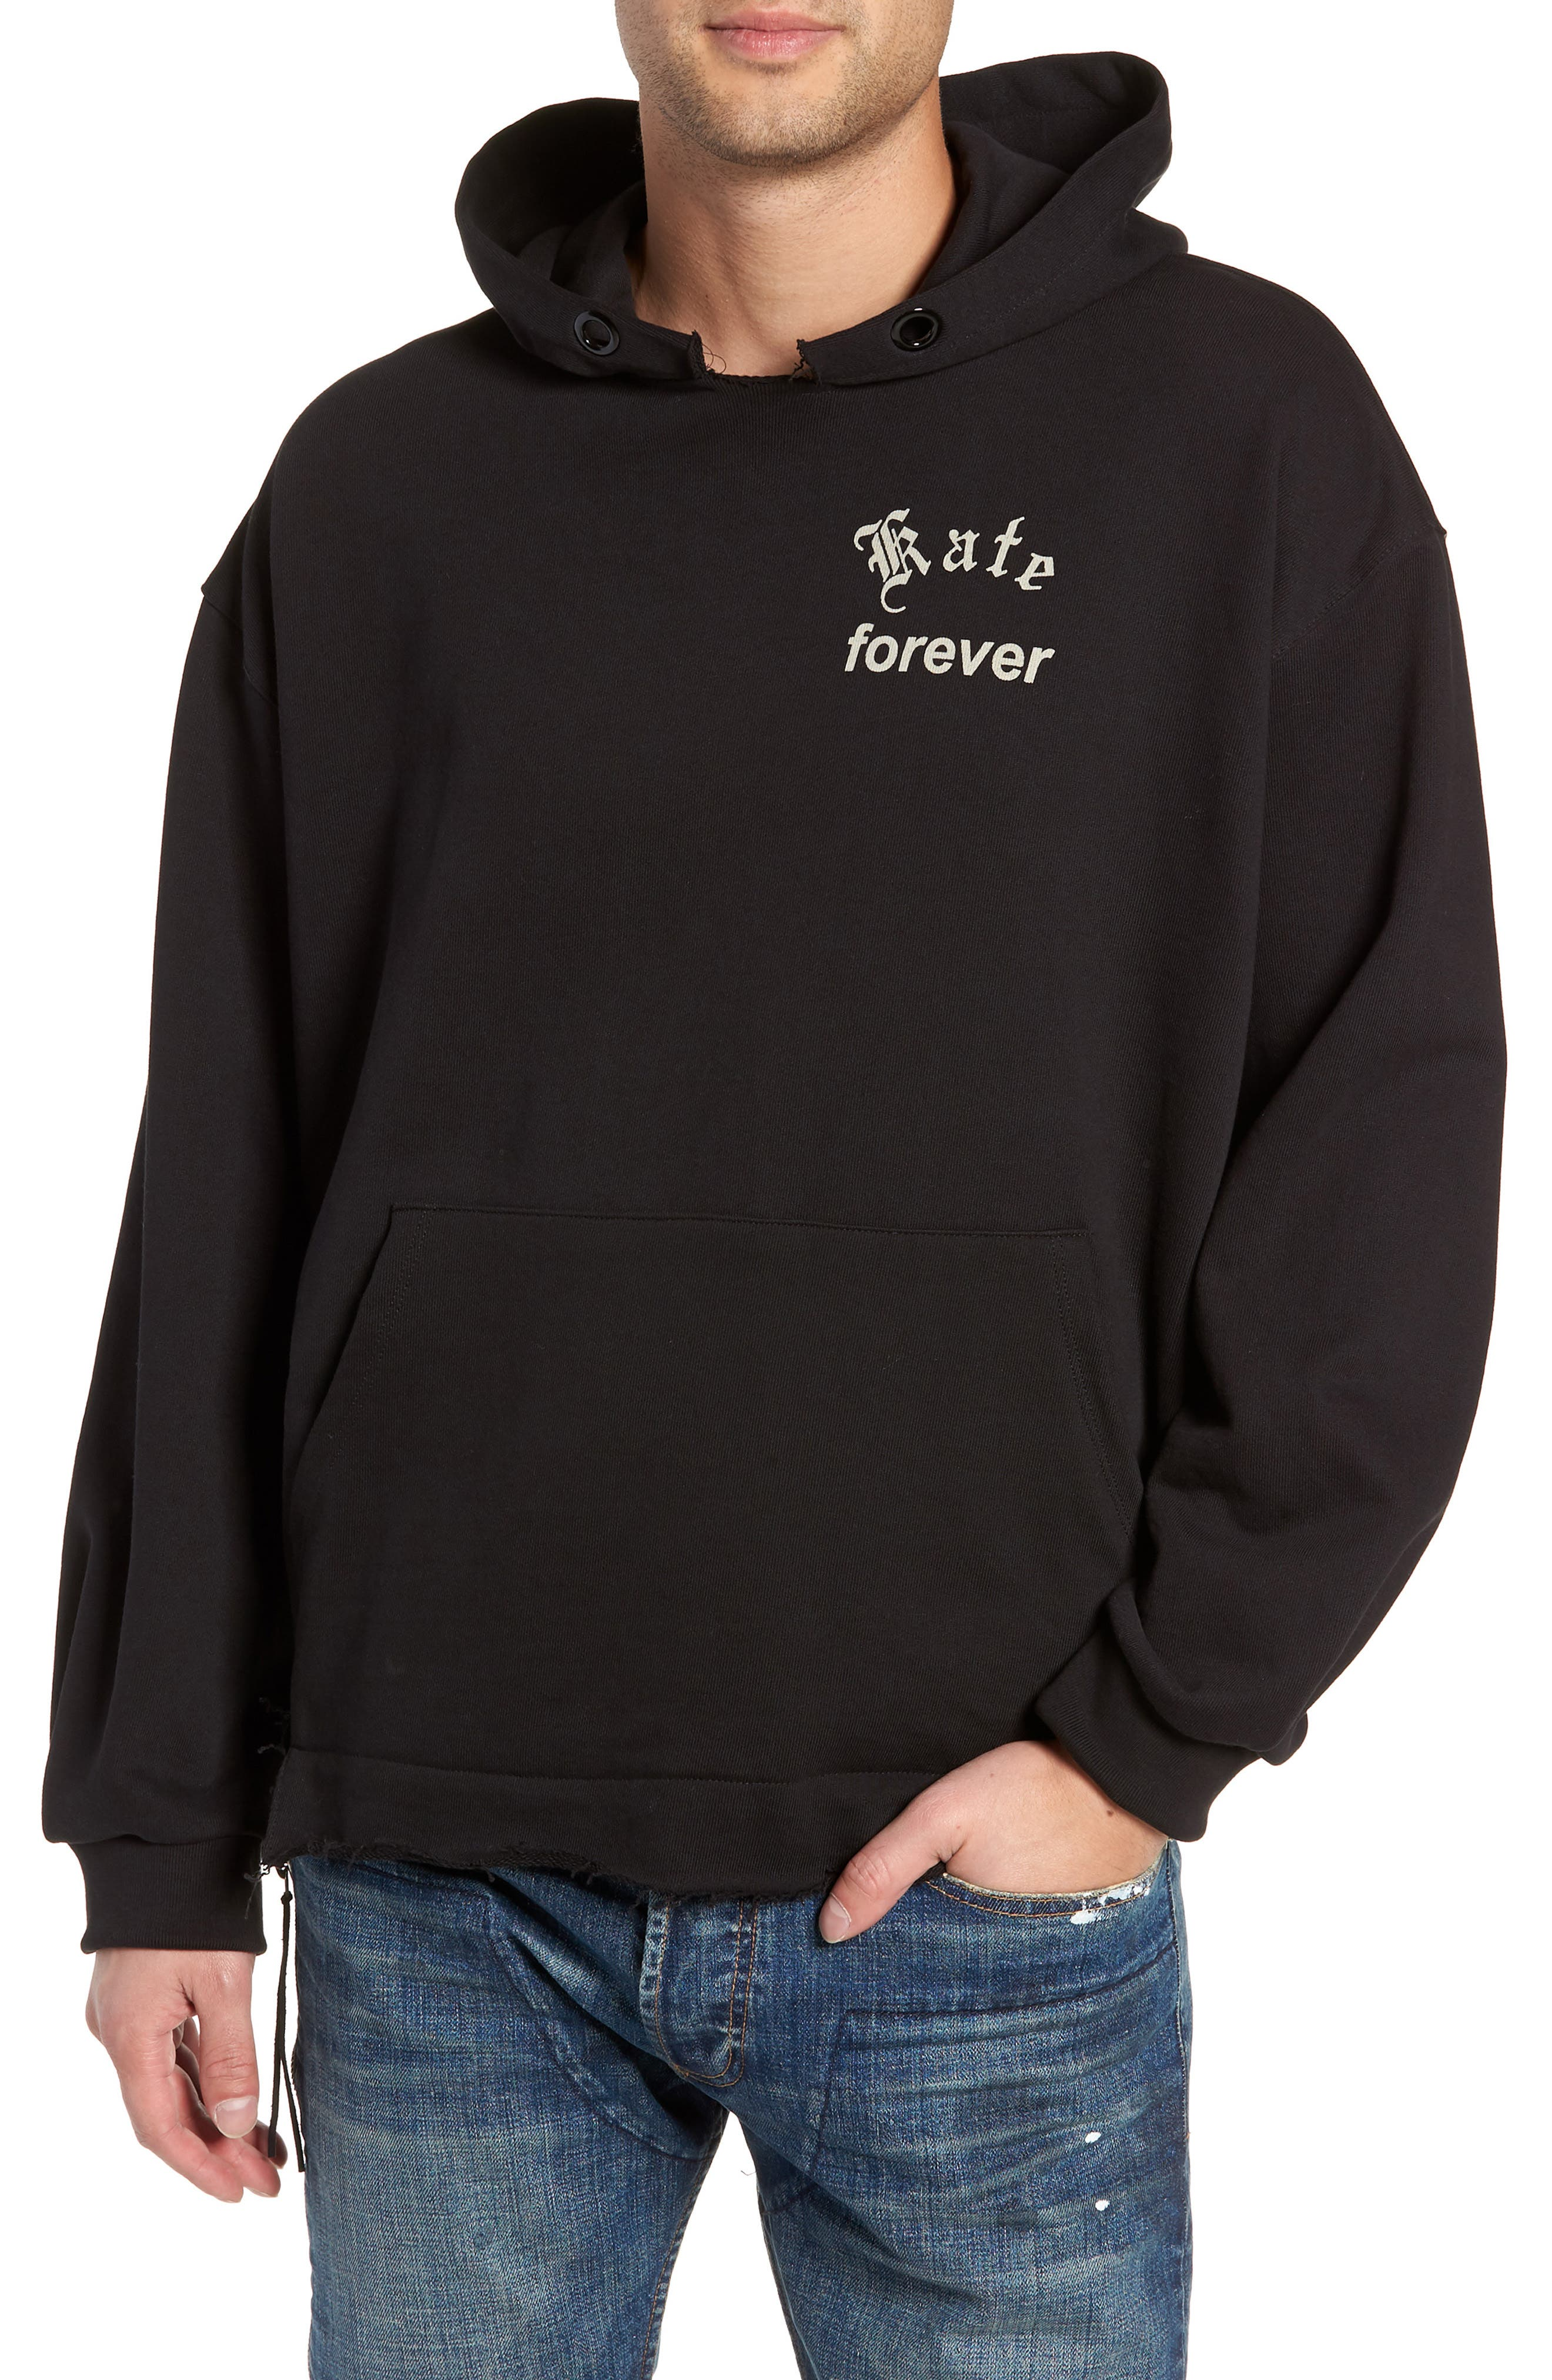 Kate Forever Oversize Hoodie,                         Main,                         color, BLACK / LEFT